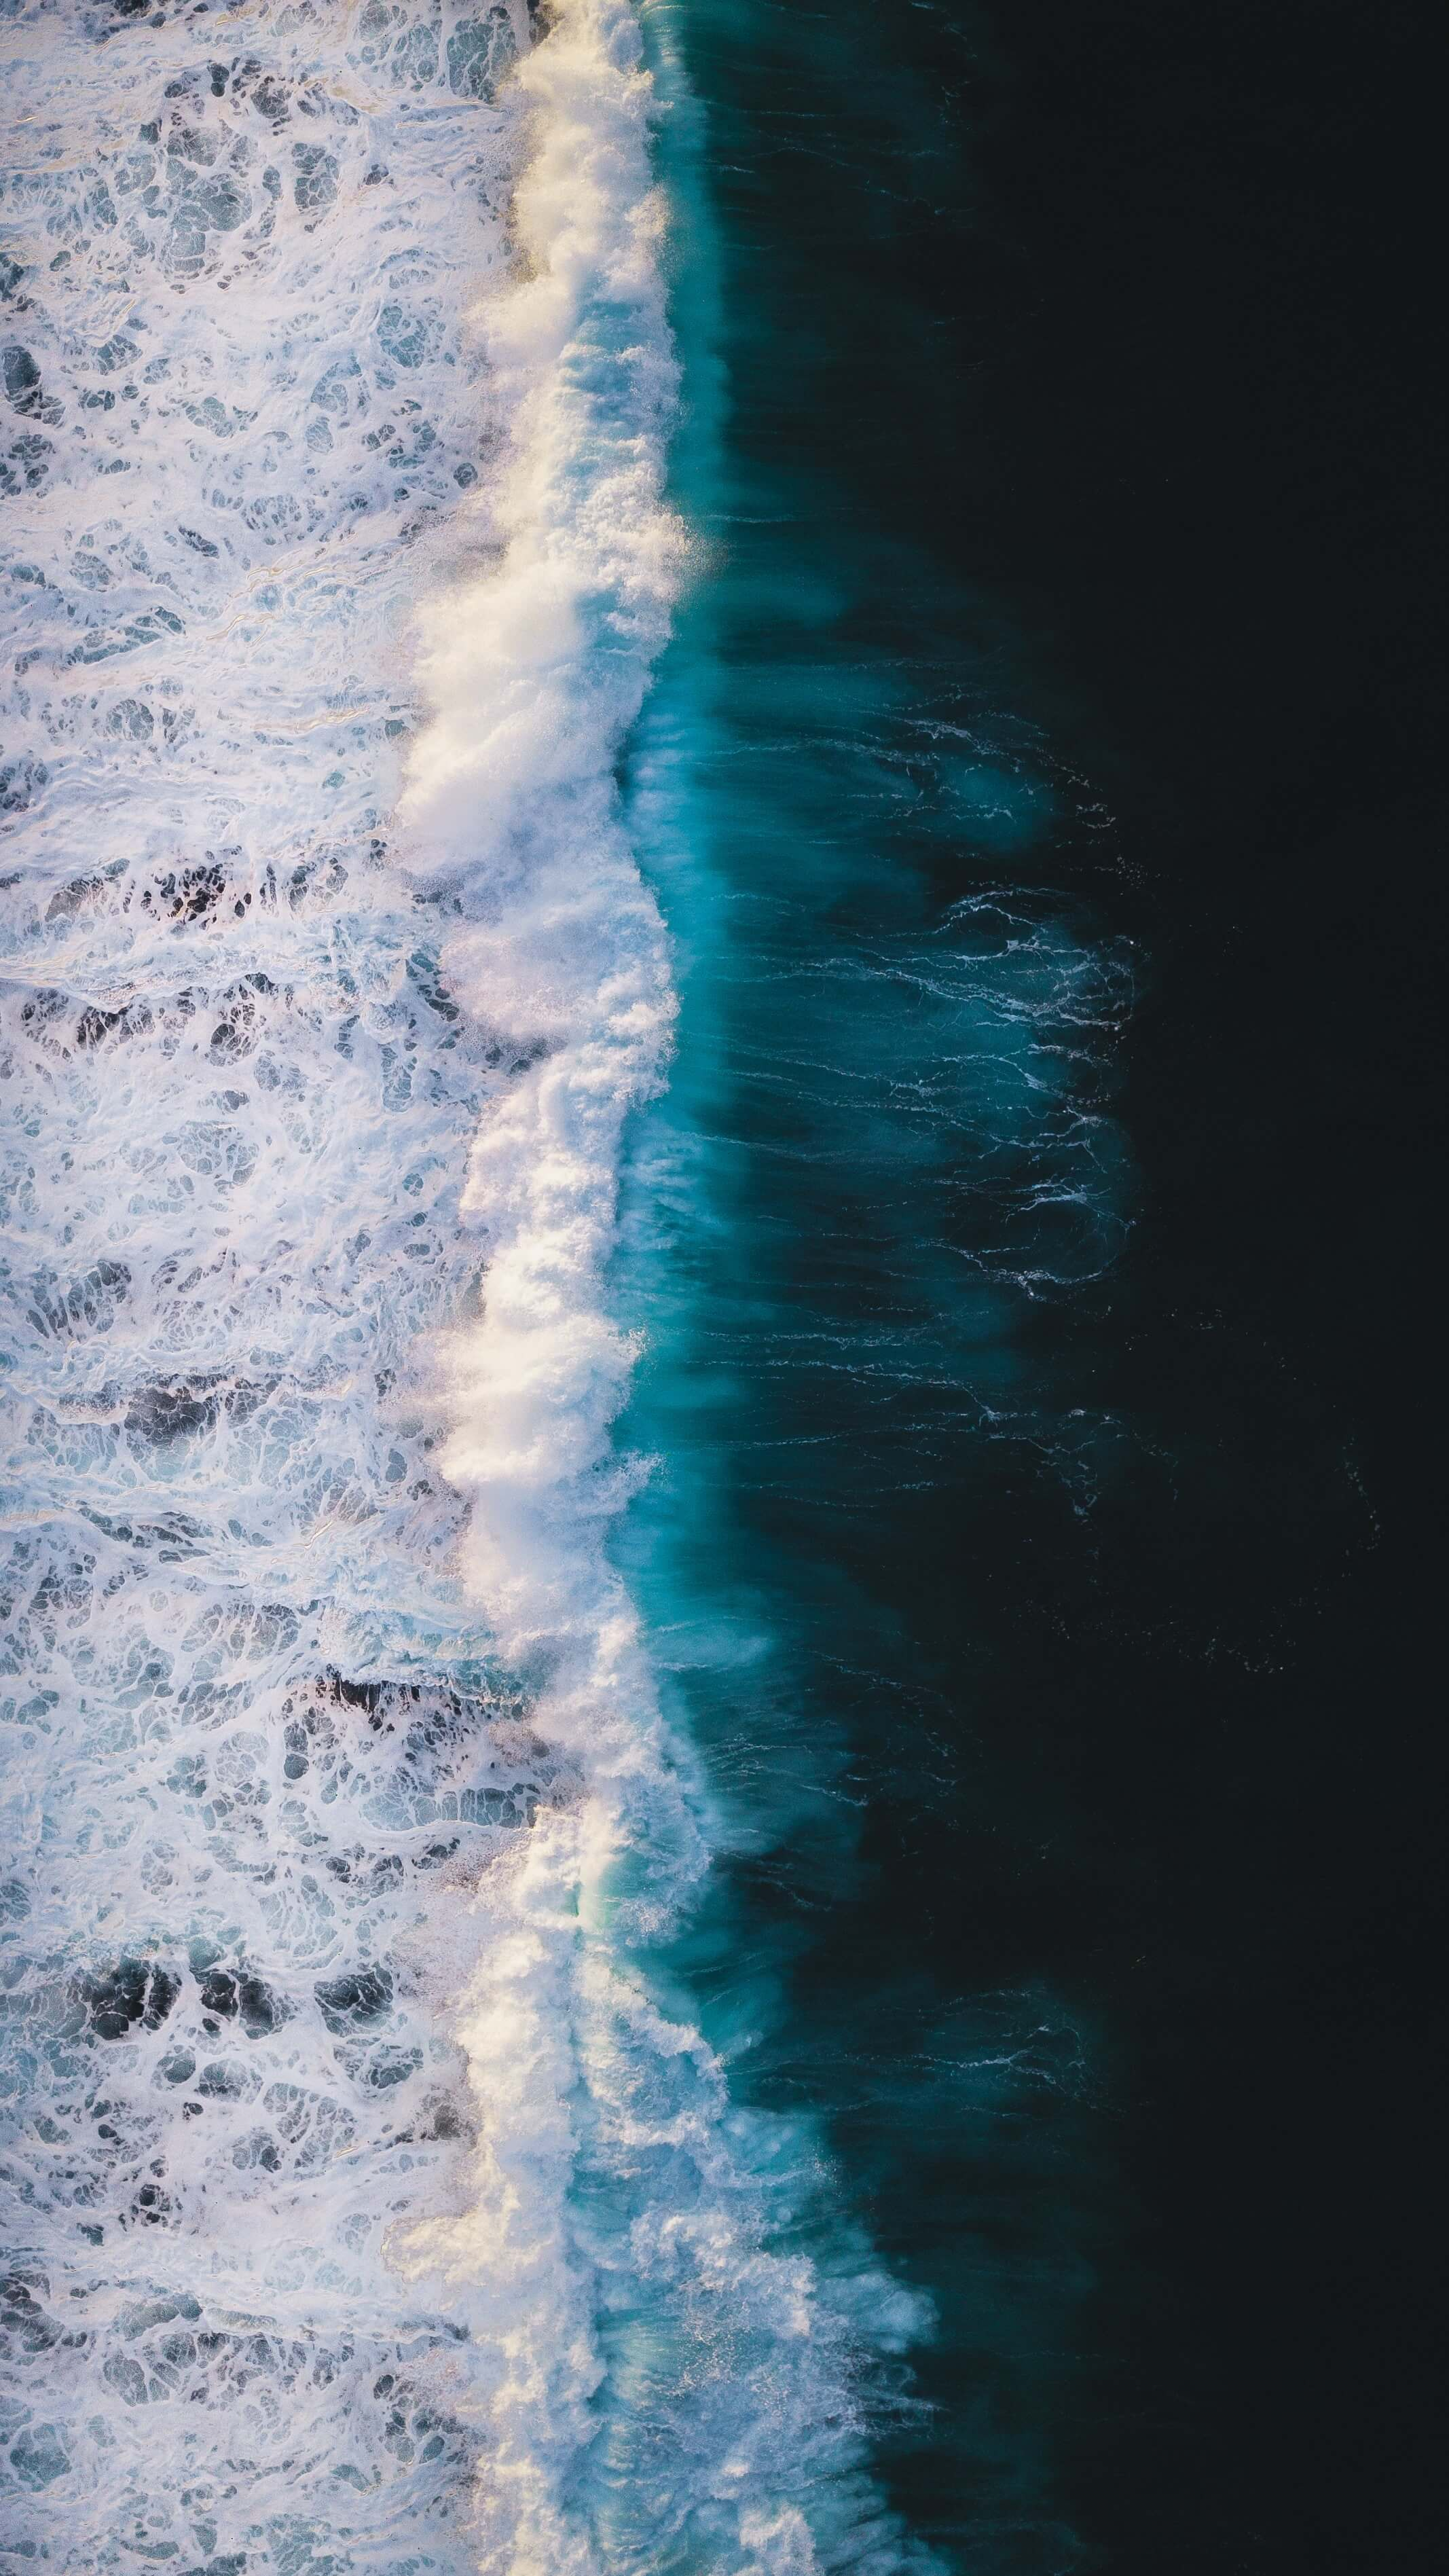 Photo by Ivan Bandura on Unsplash